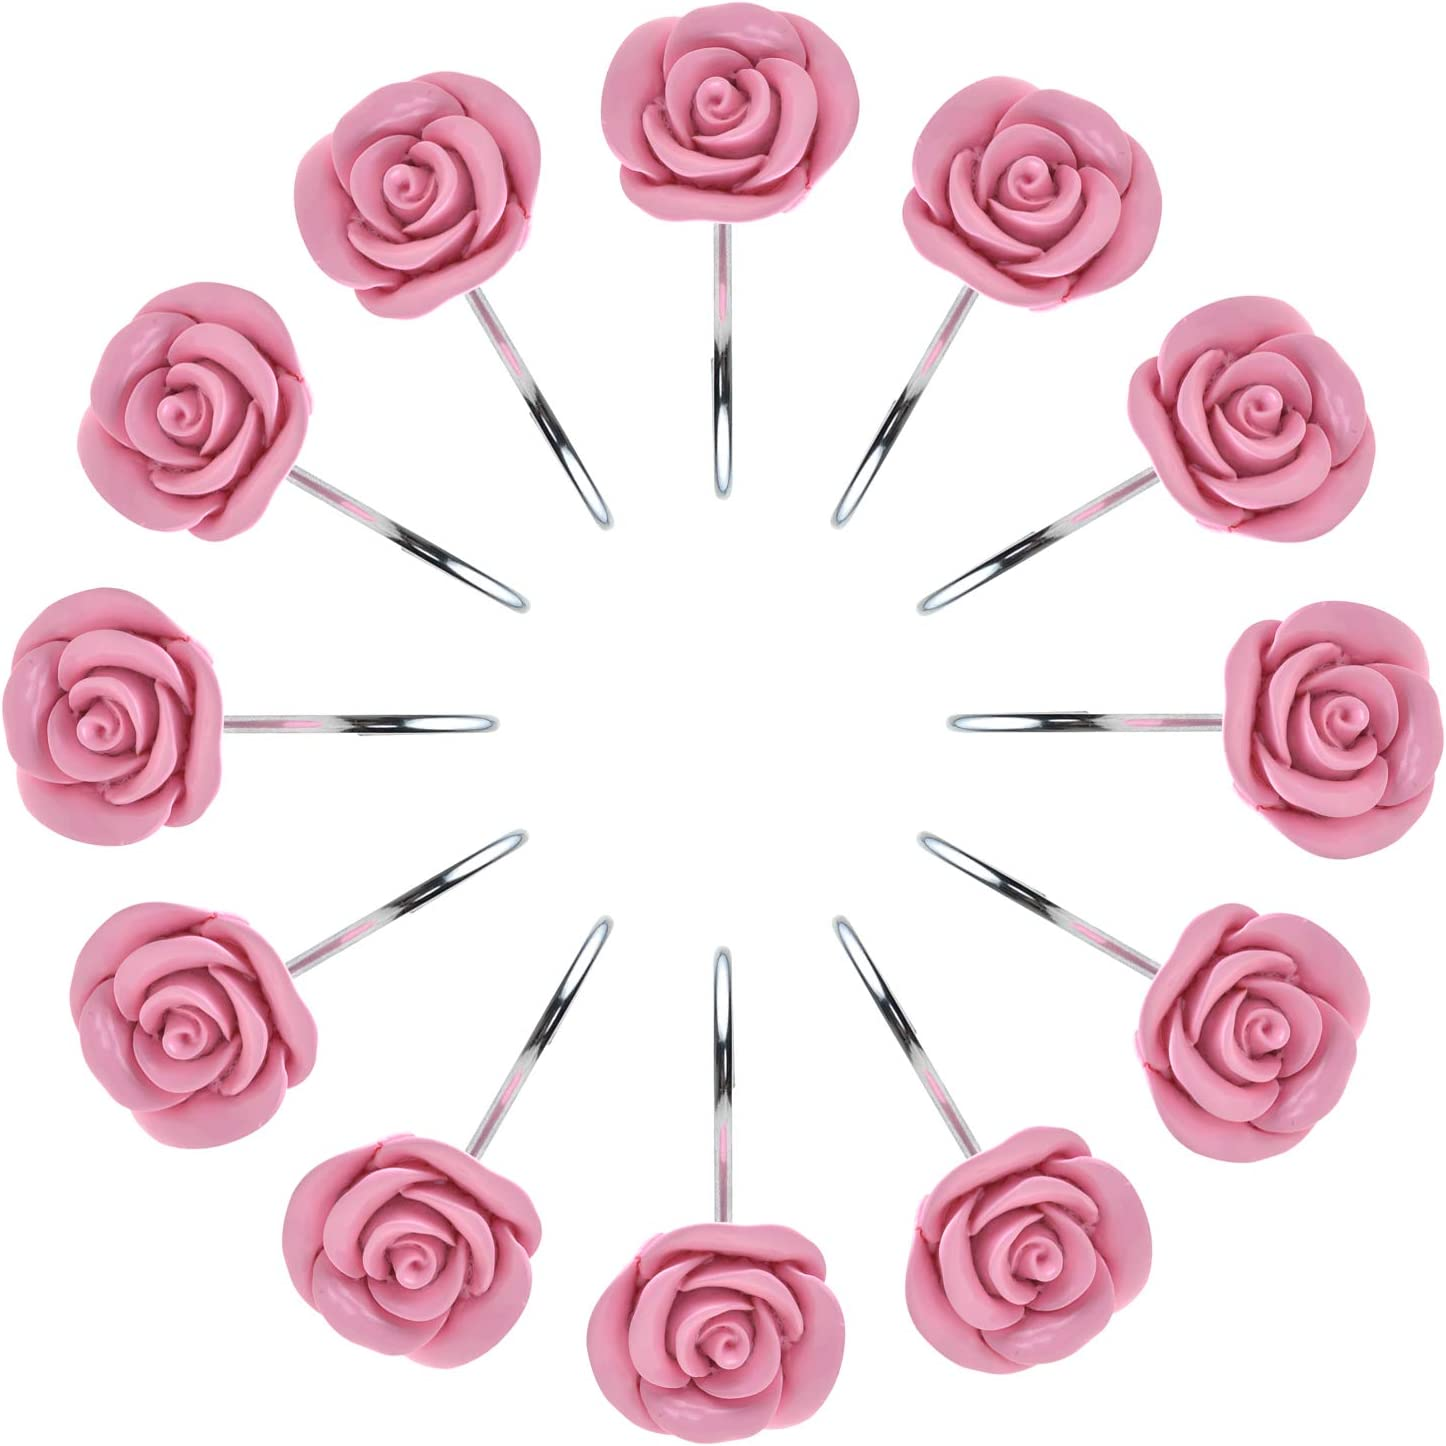 AGPTEK Shower Curtain Hooks, 12PCS Anti Rust Decorative Resin Hooks for Bathroom, Baby Room, Bedroom, Living Room Decor (Pink Rose)